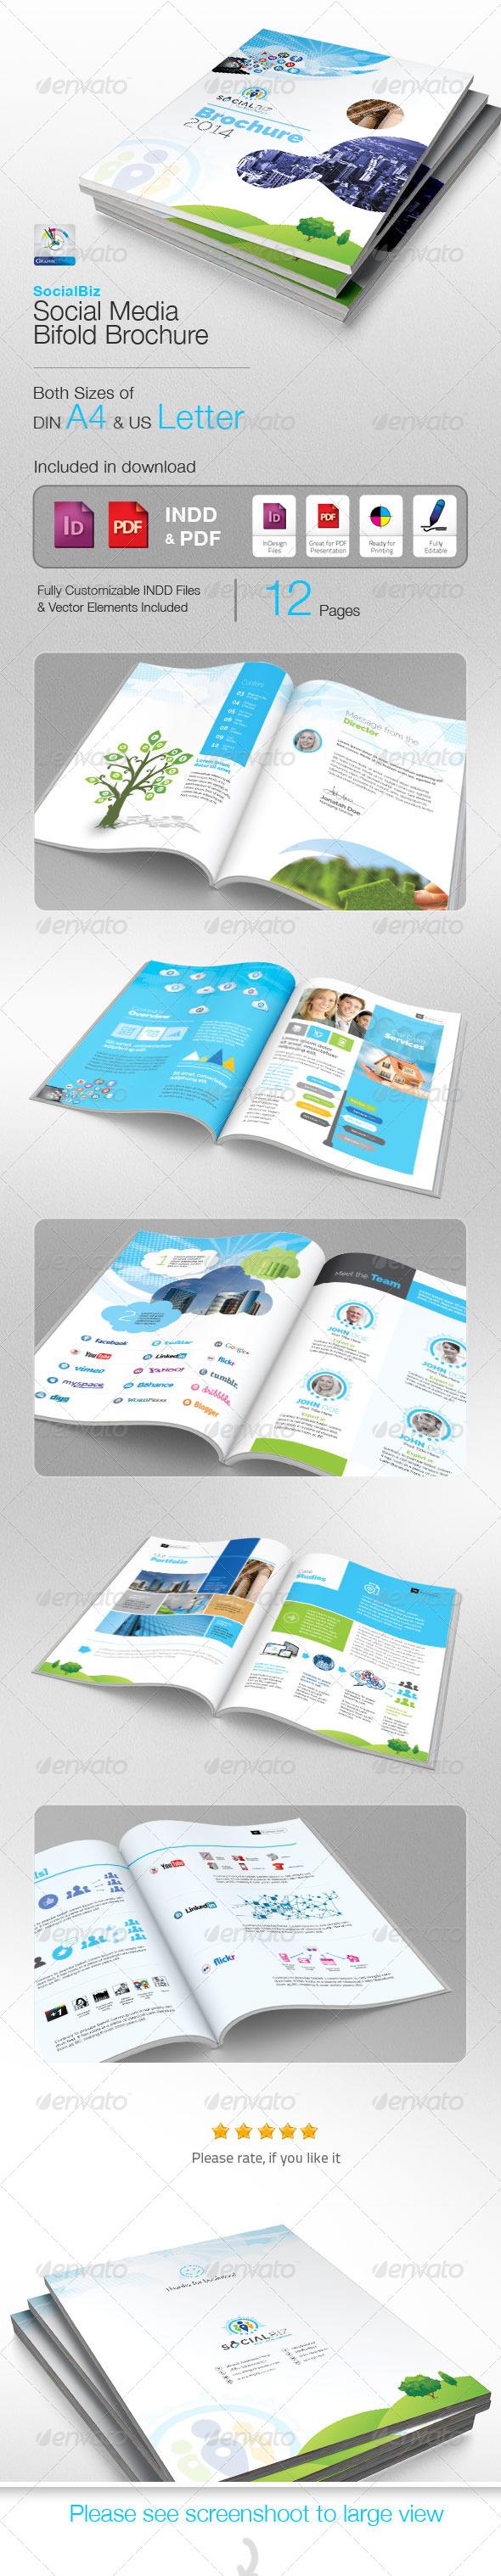 GraphicRiver SocialBiz Professional Social Media Brochure 5747201